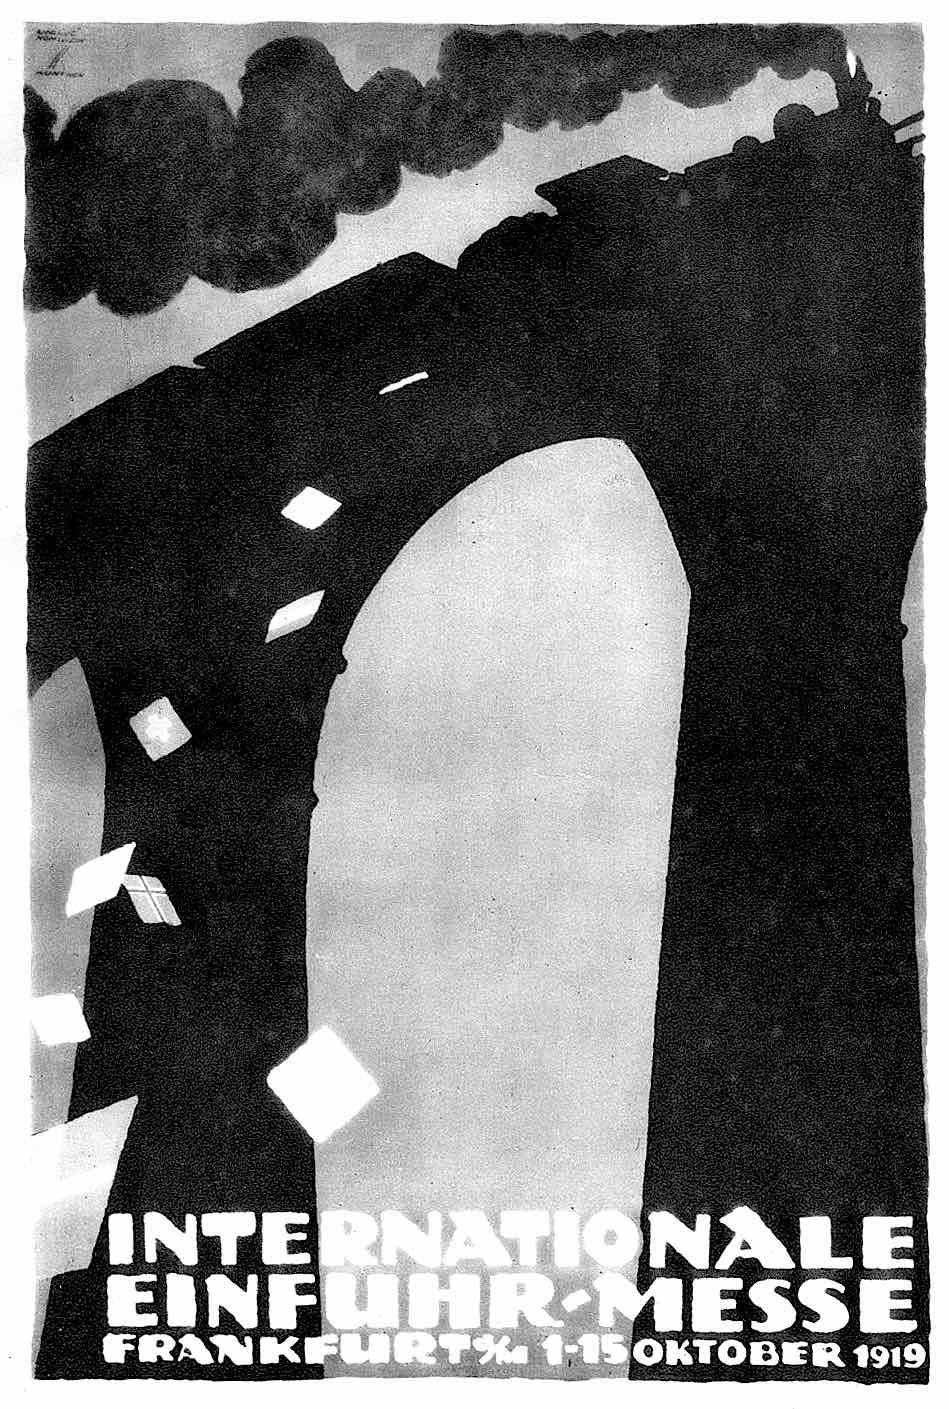 a 1919 Ludwig Hohlwein poster in silhouette, International Einfuhr-Mess Frankfurt